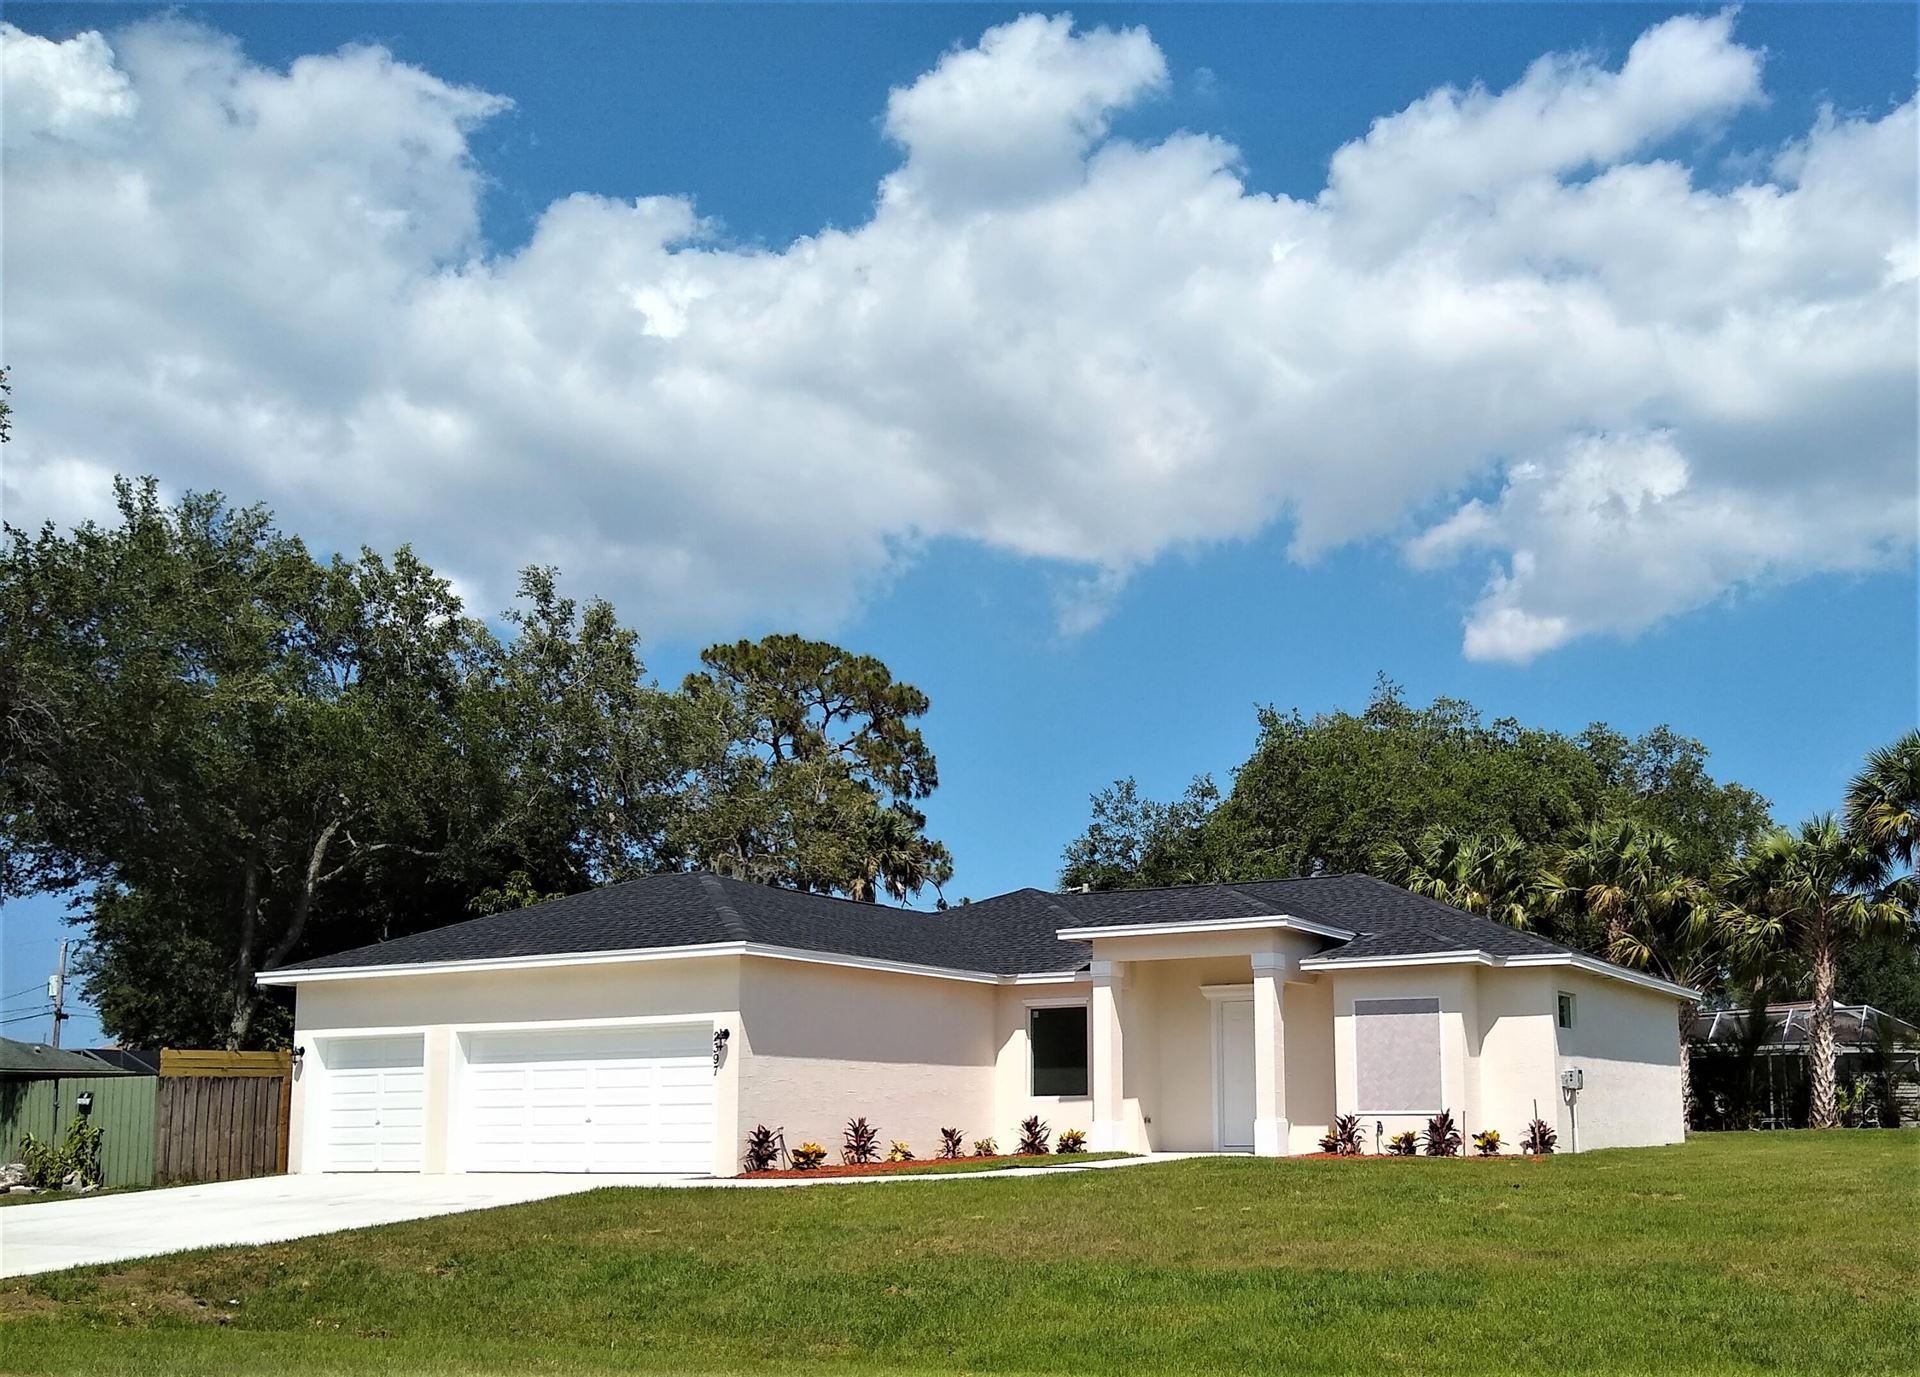 2397 SW Scodella Terrace, Port Saint Lucie, FL 34953 - MLS#: RX-10713070